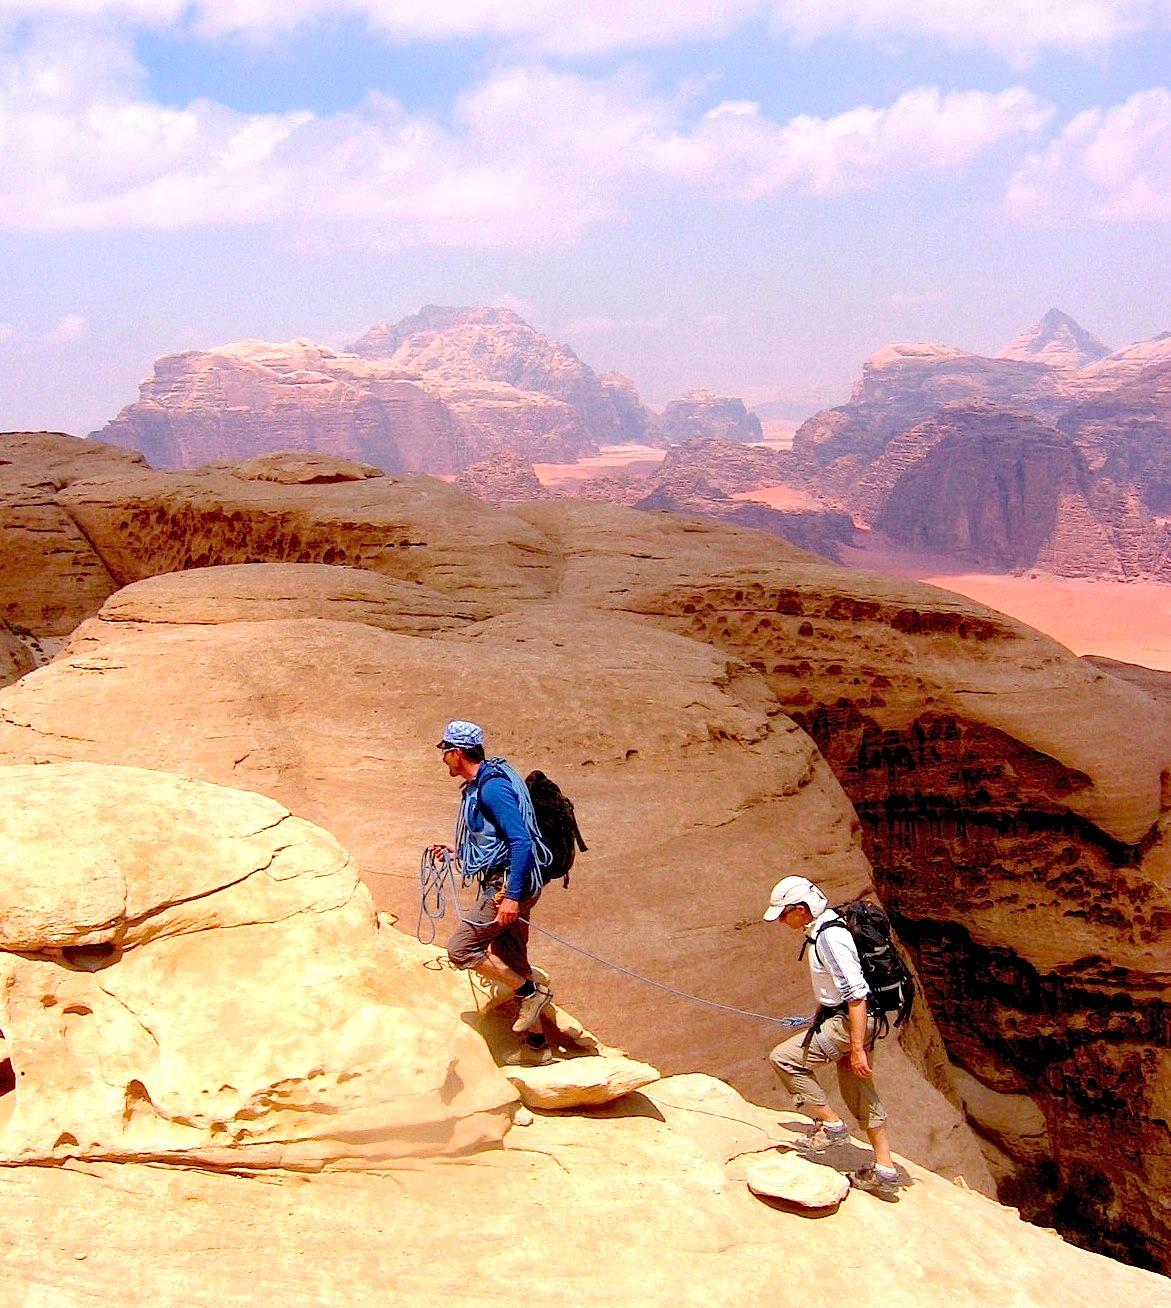 Jebel Khazali - une cordée vers le sommet